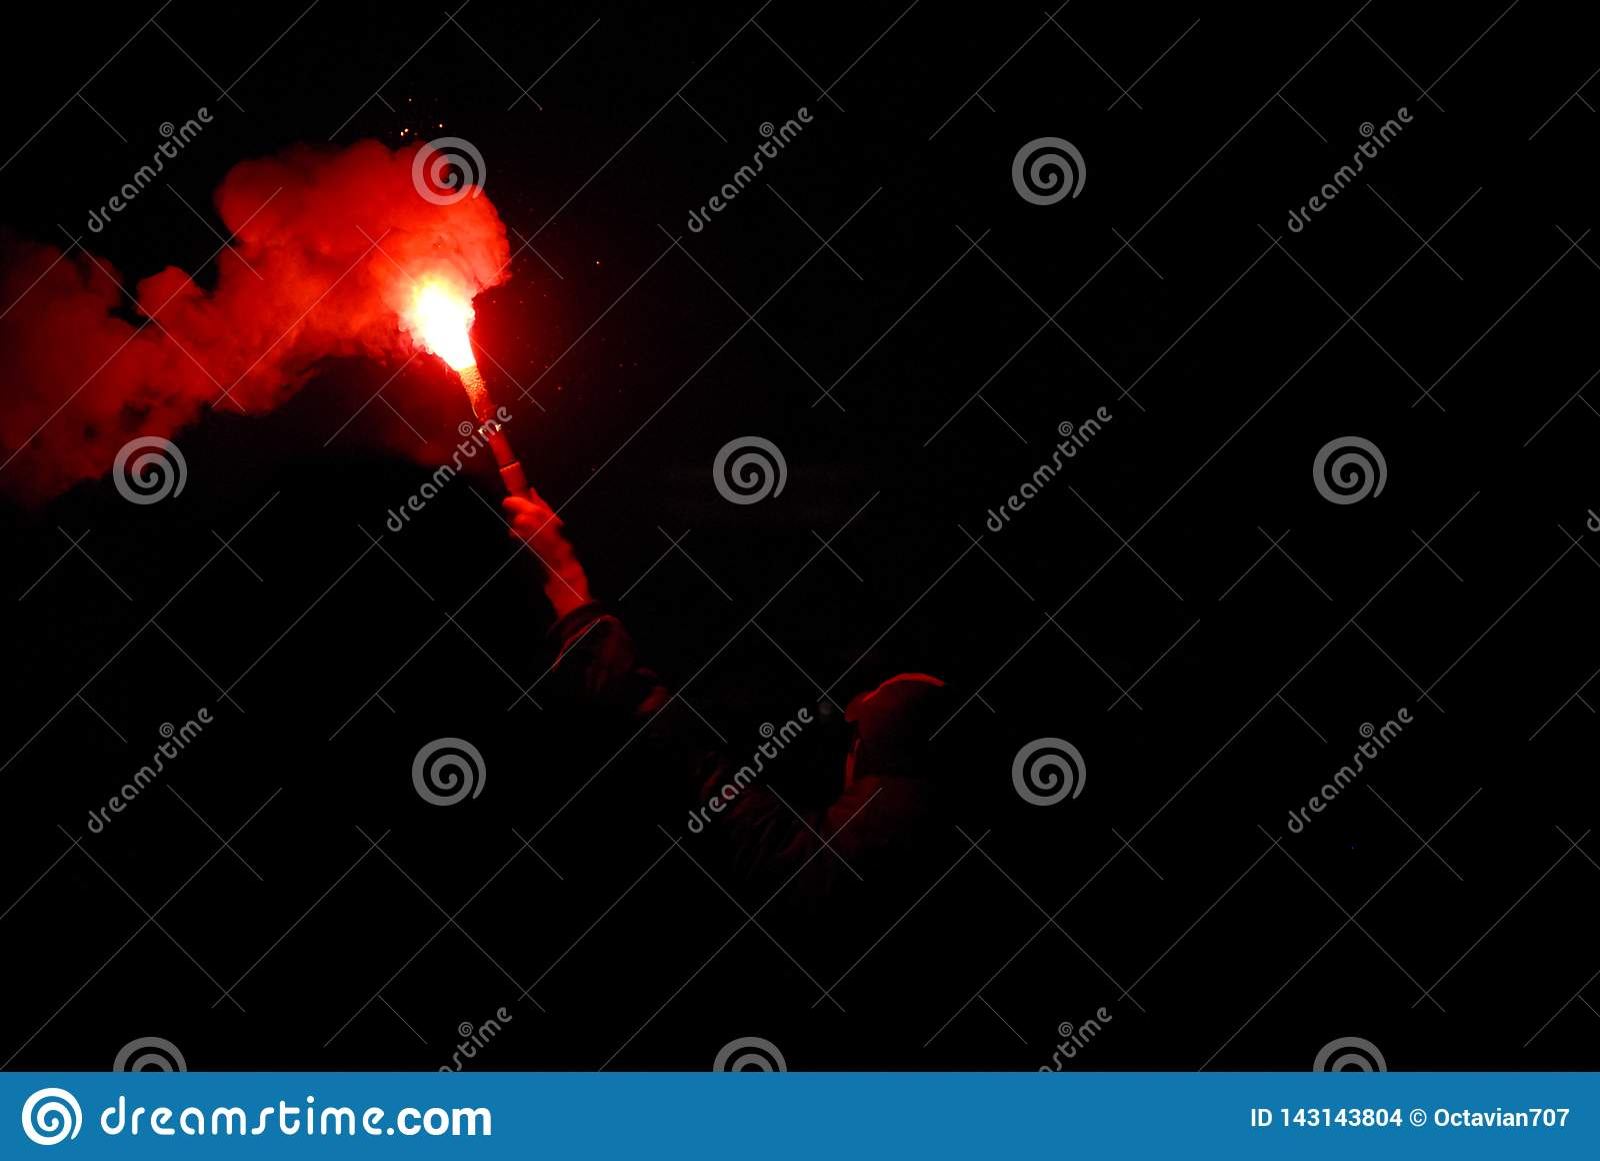 Man holding a burning red bonfire stick